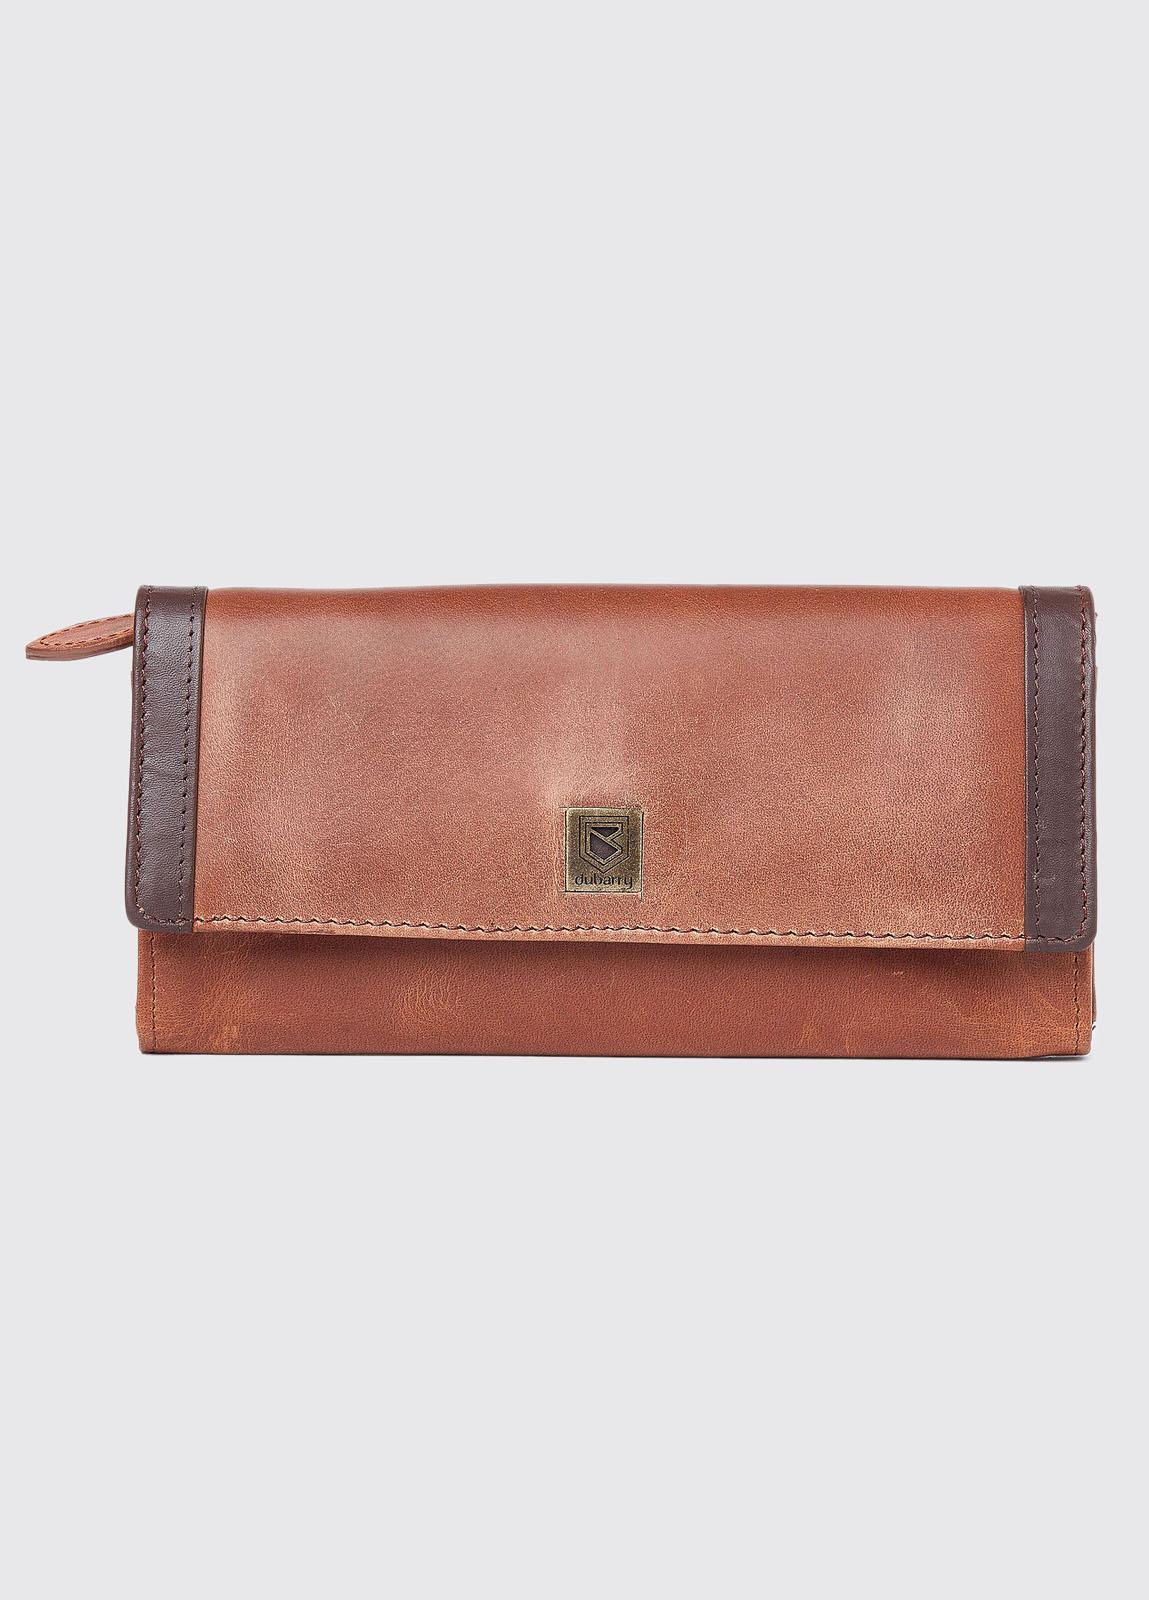 Collinstown Leather Wallet - Chestnut